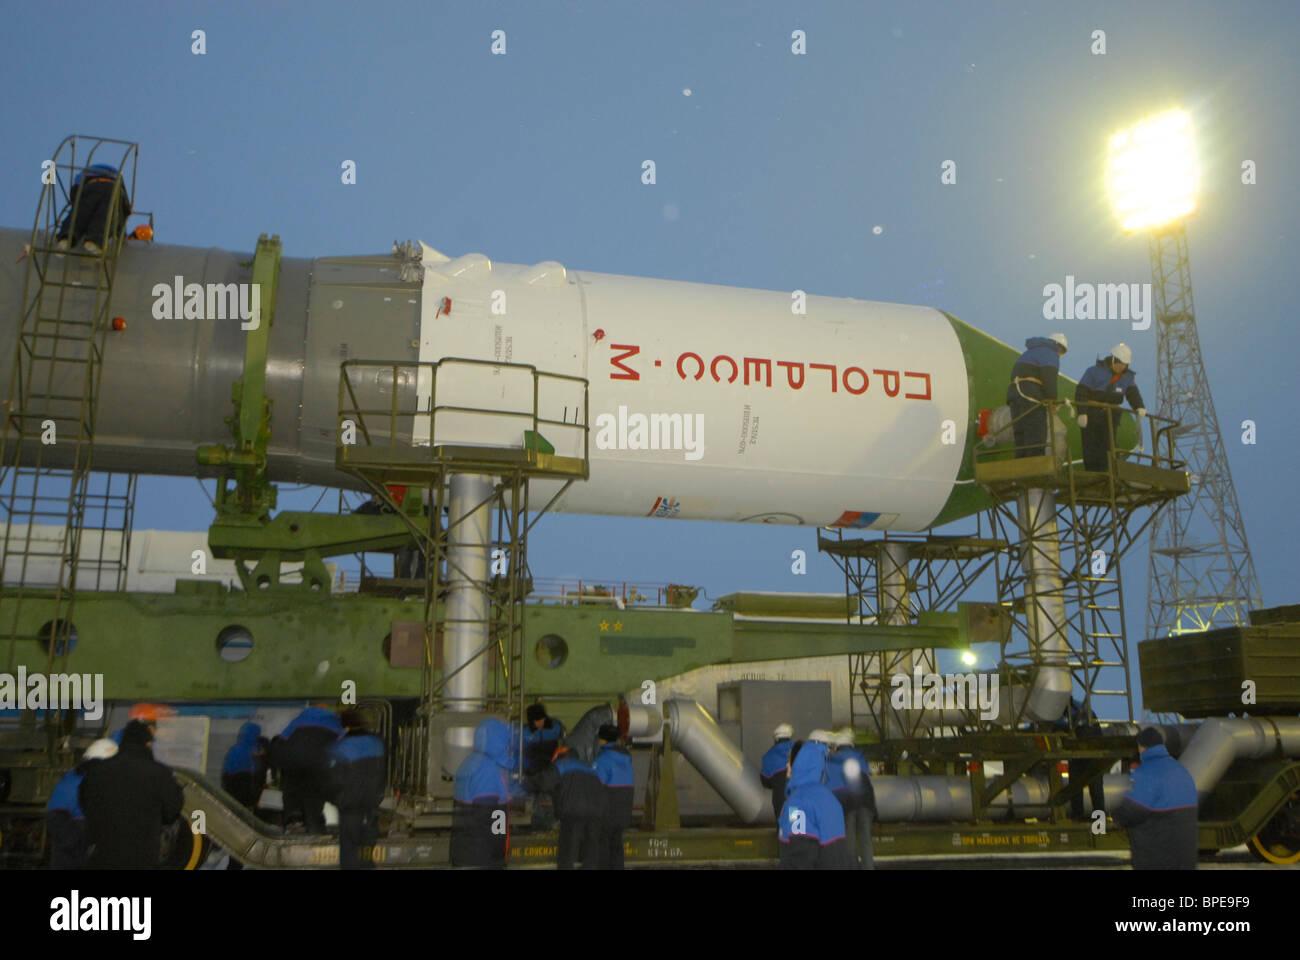 Launch preparation for Soyuz-U rocket carrying spacecraft Progress M-62 at Baikonur Cosmodrome - Stock Image